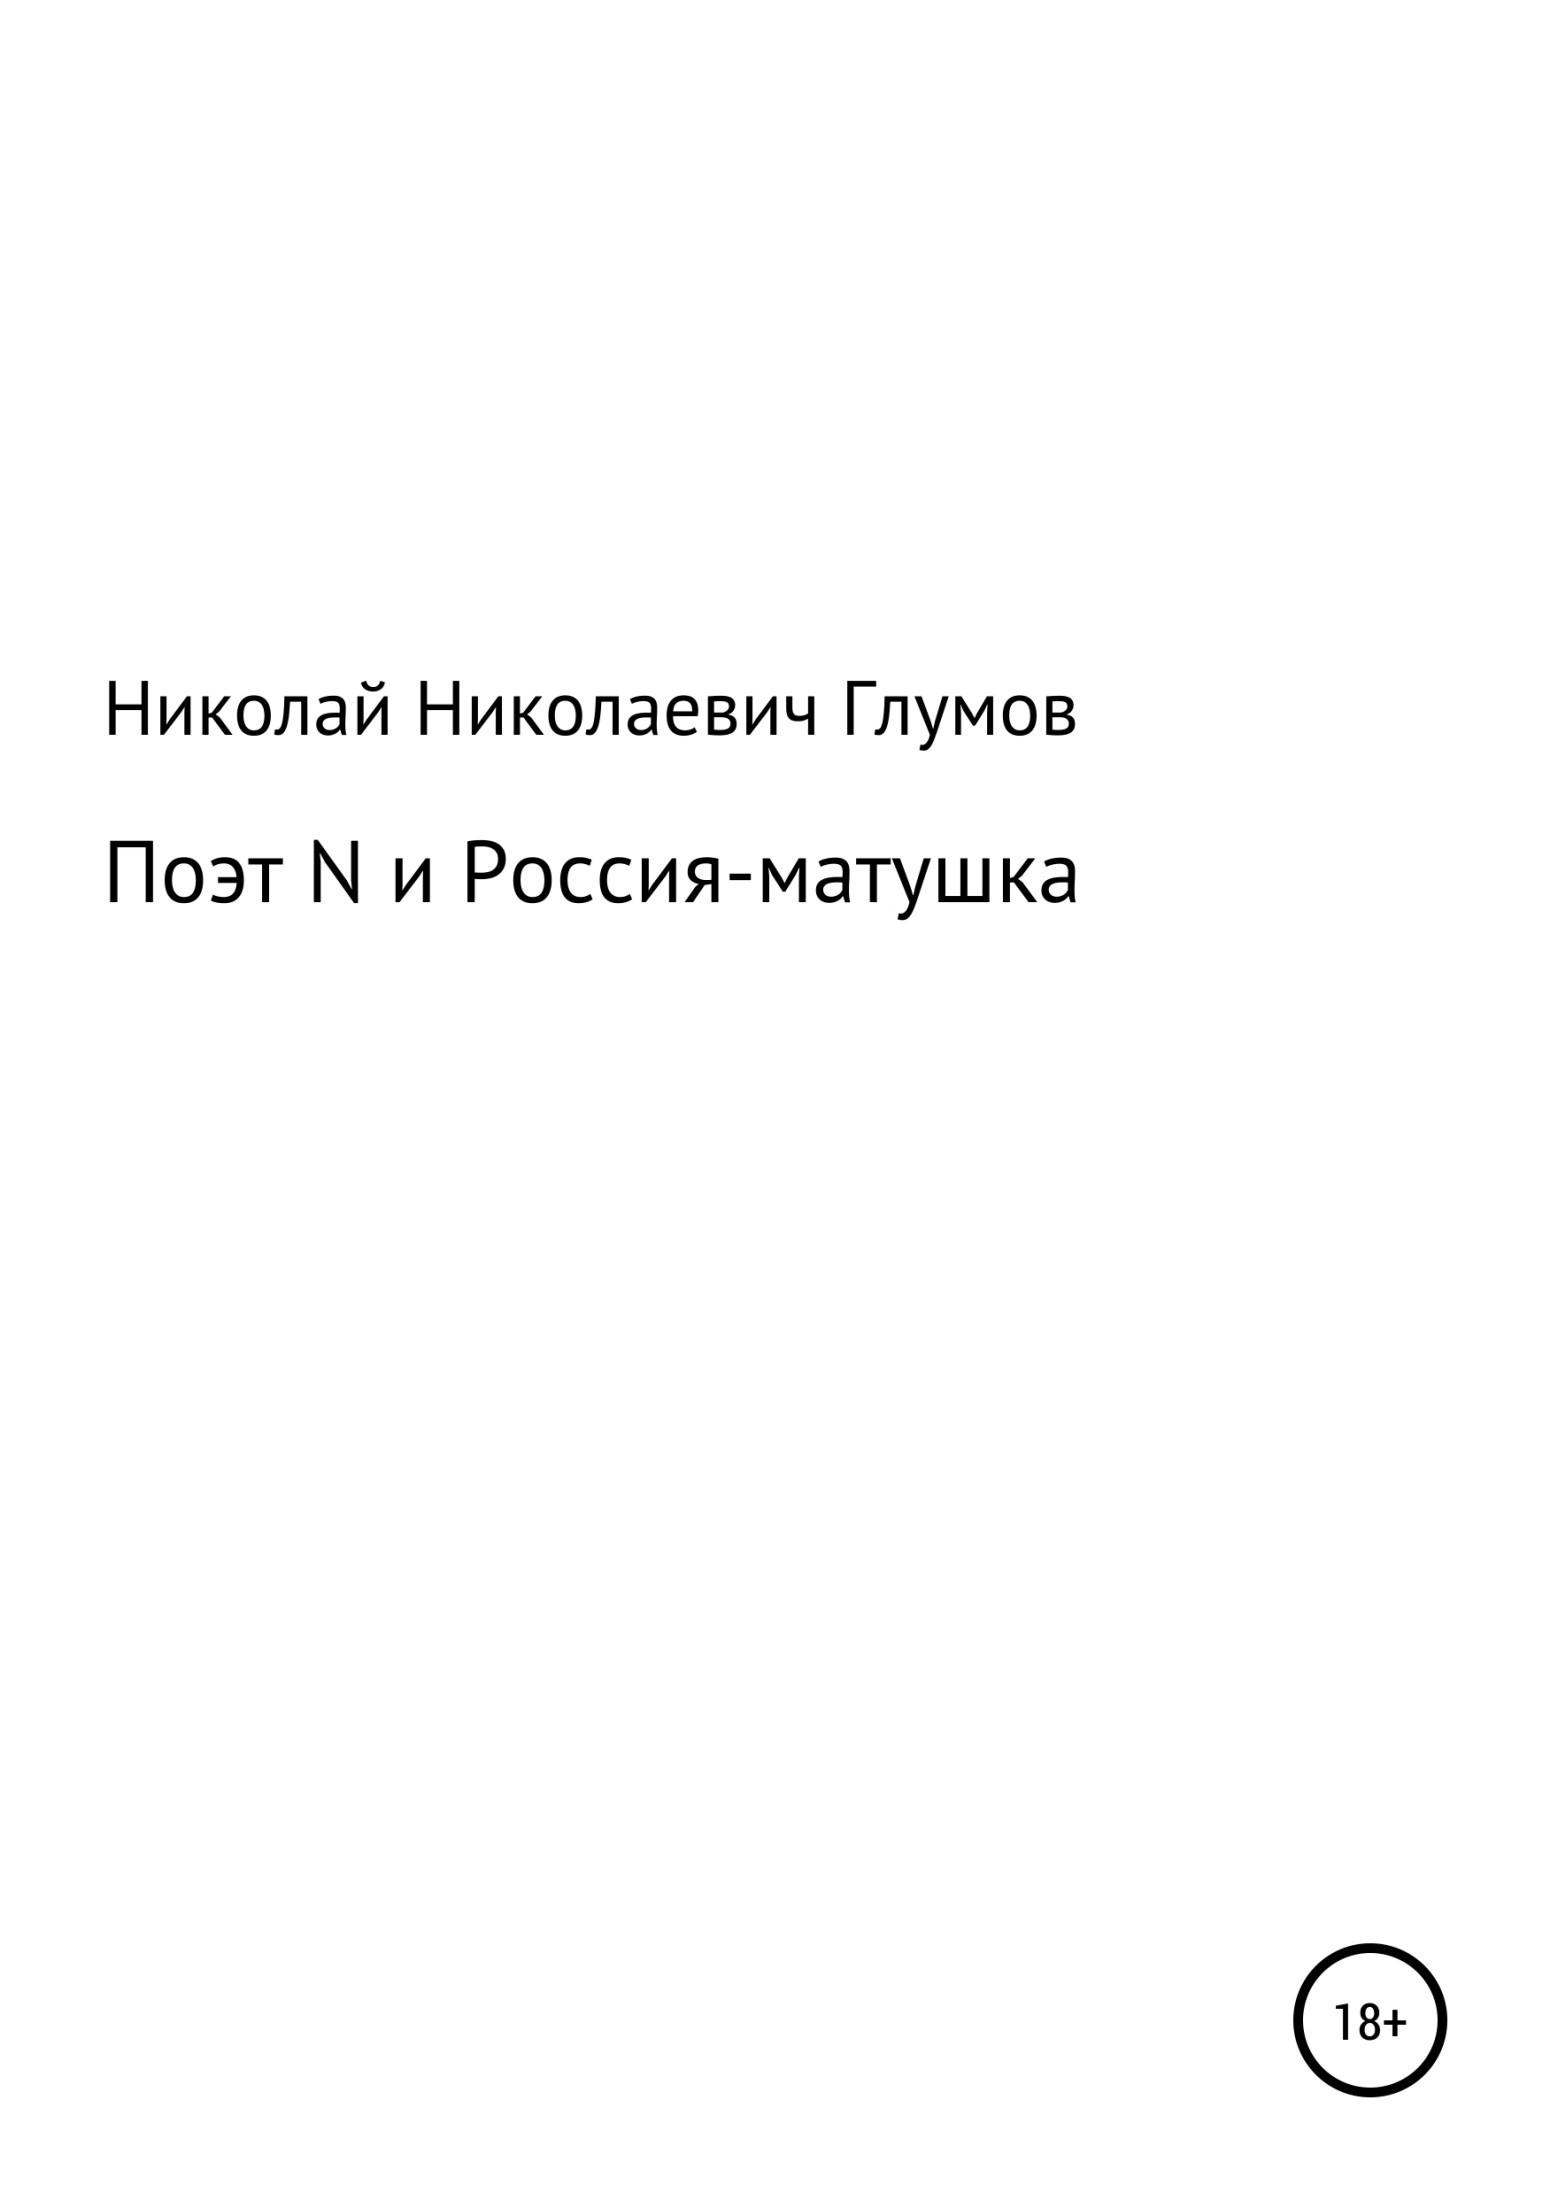 Николай Николаевич Глумов Поэт N и Россия-матушка николай николаевич глумов красный флаг над заводом